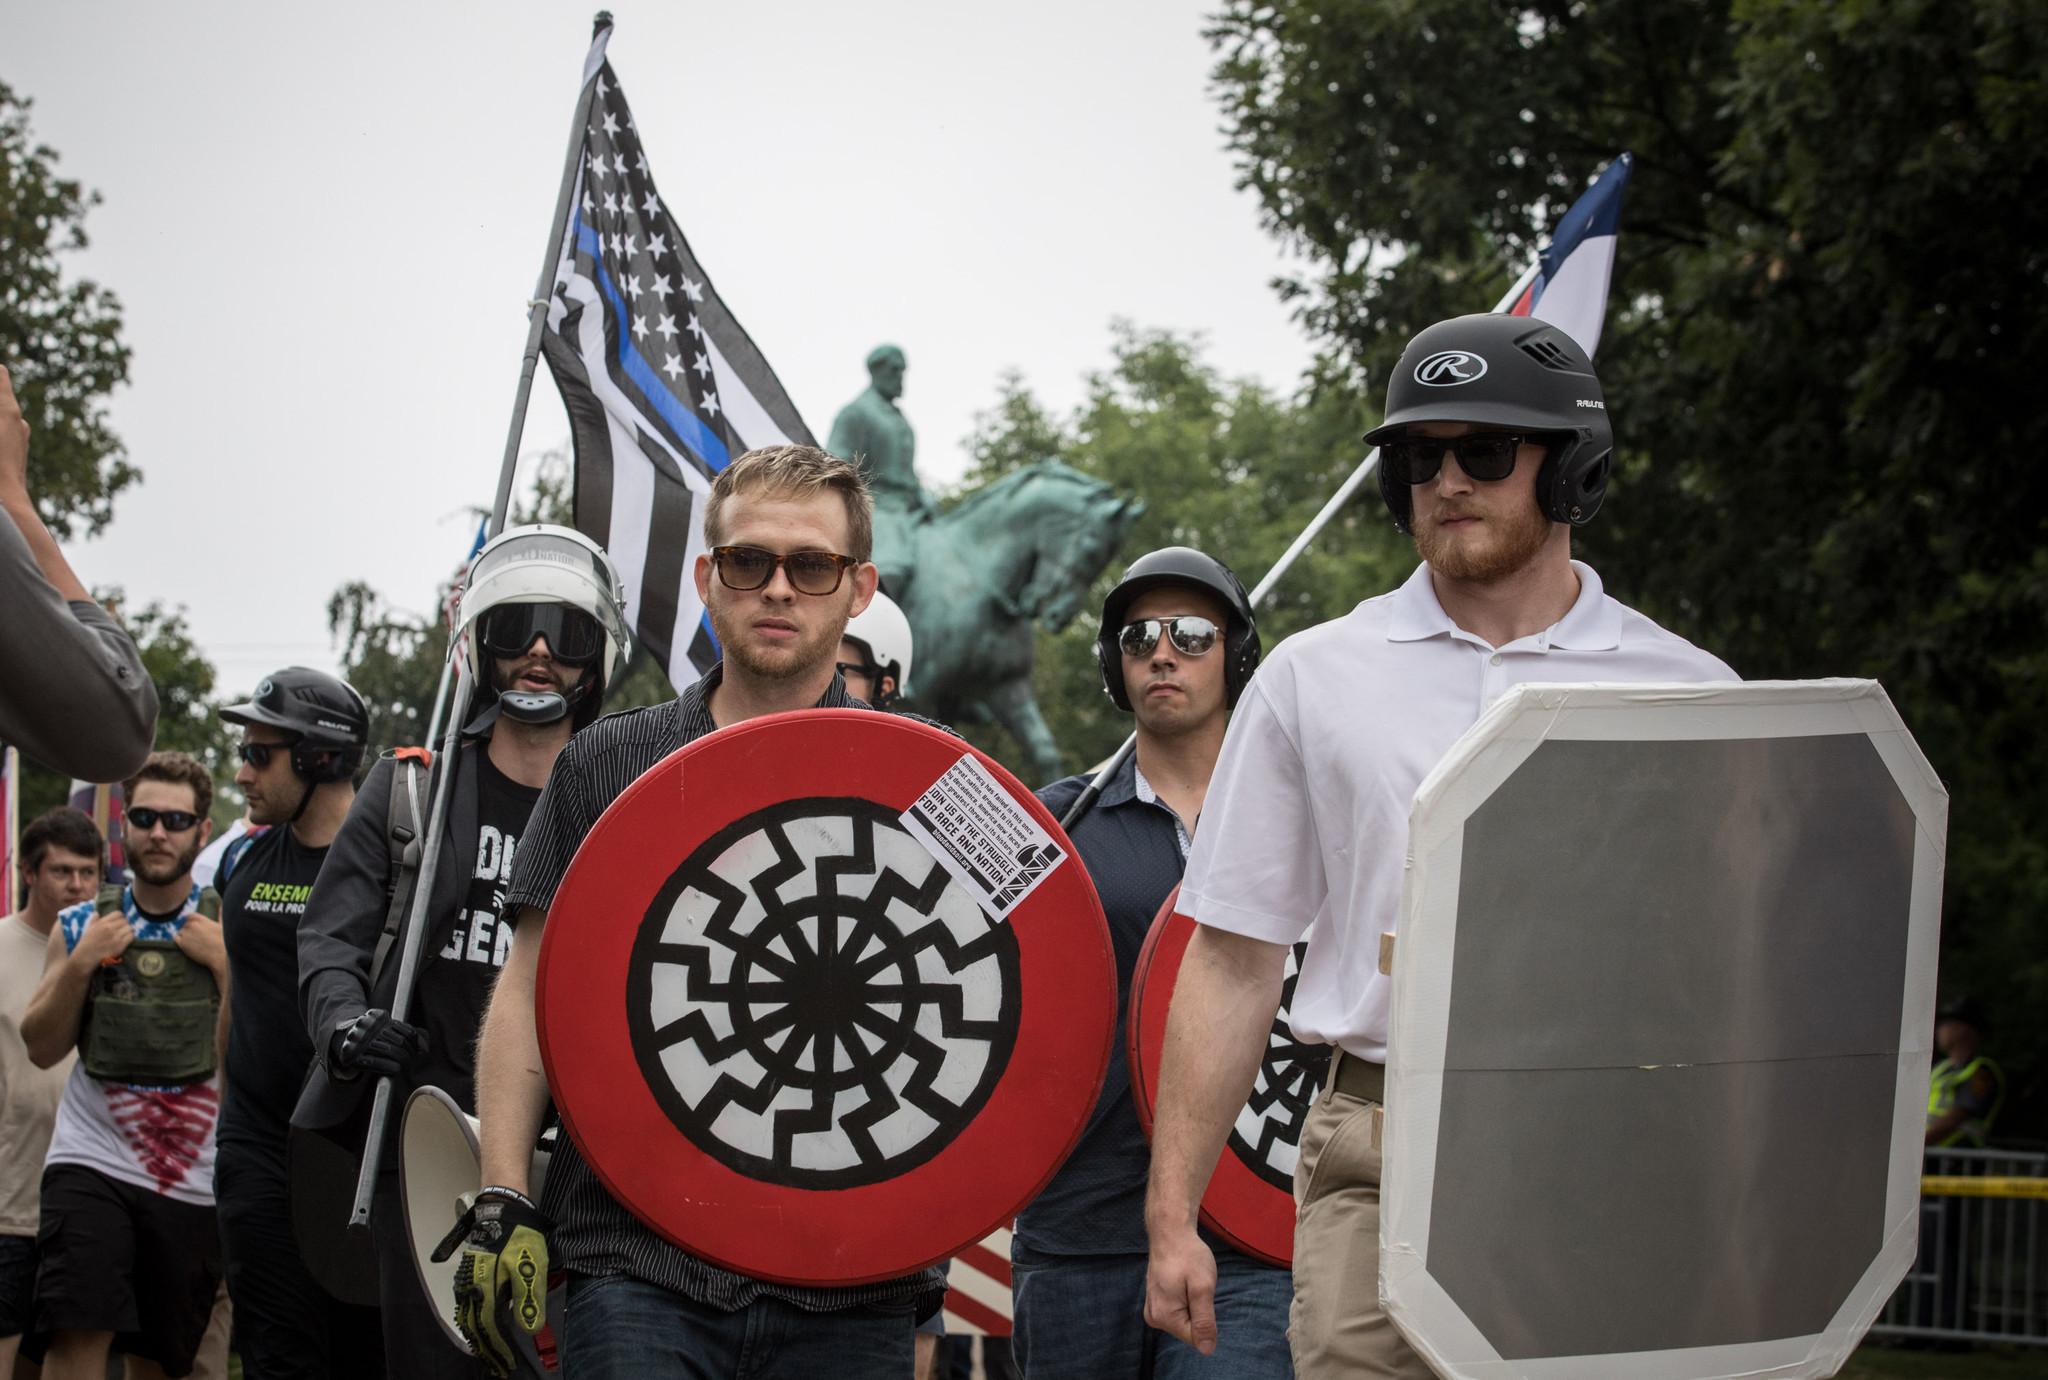 Emboldened white nationalists say Charlottesville is just the beginning  Chicago Tribune